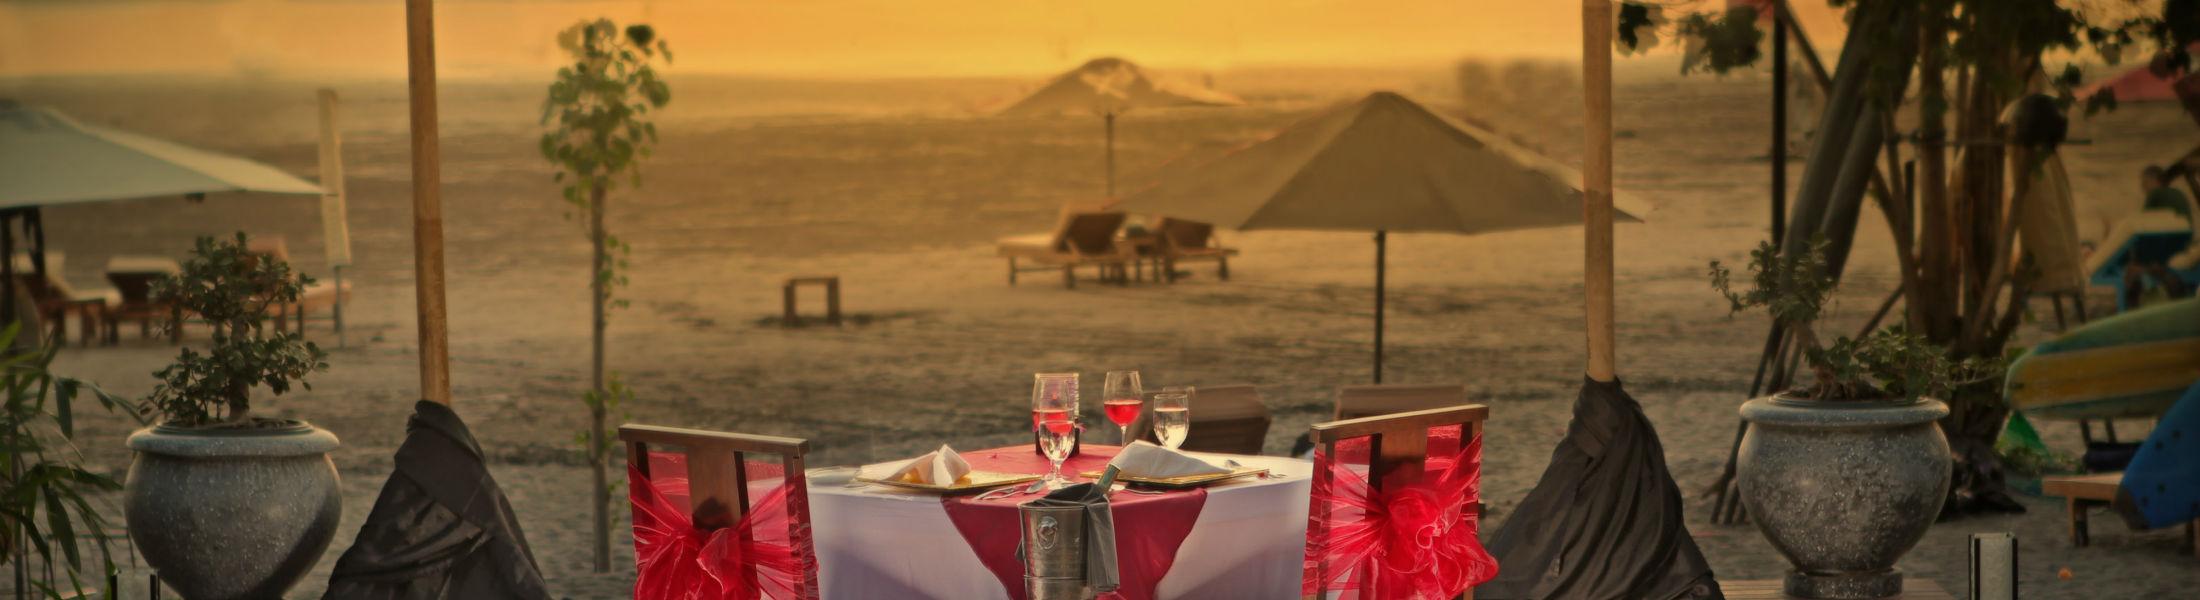 Dining By Design on the beach at the Anantara Seminyak Bali